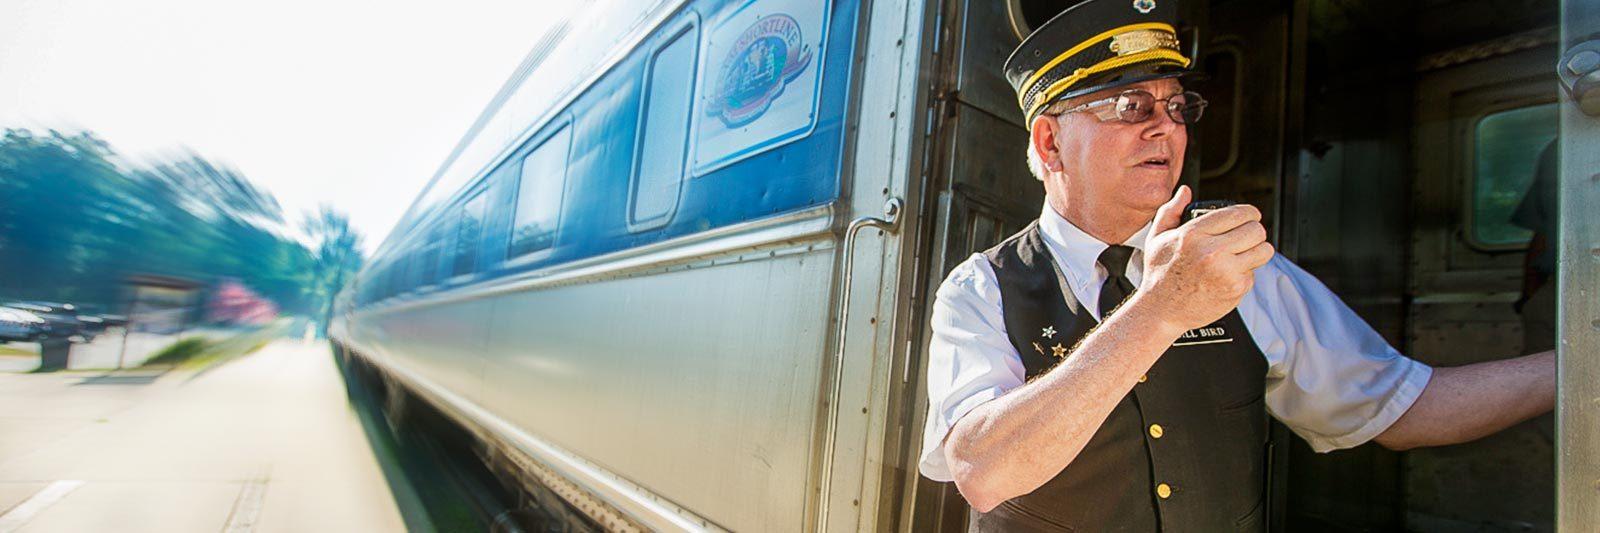 Lake-Blackshear-Georgia-Train-Excursions-GA-Veterans-SAM-Shortline-Train-1